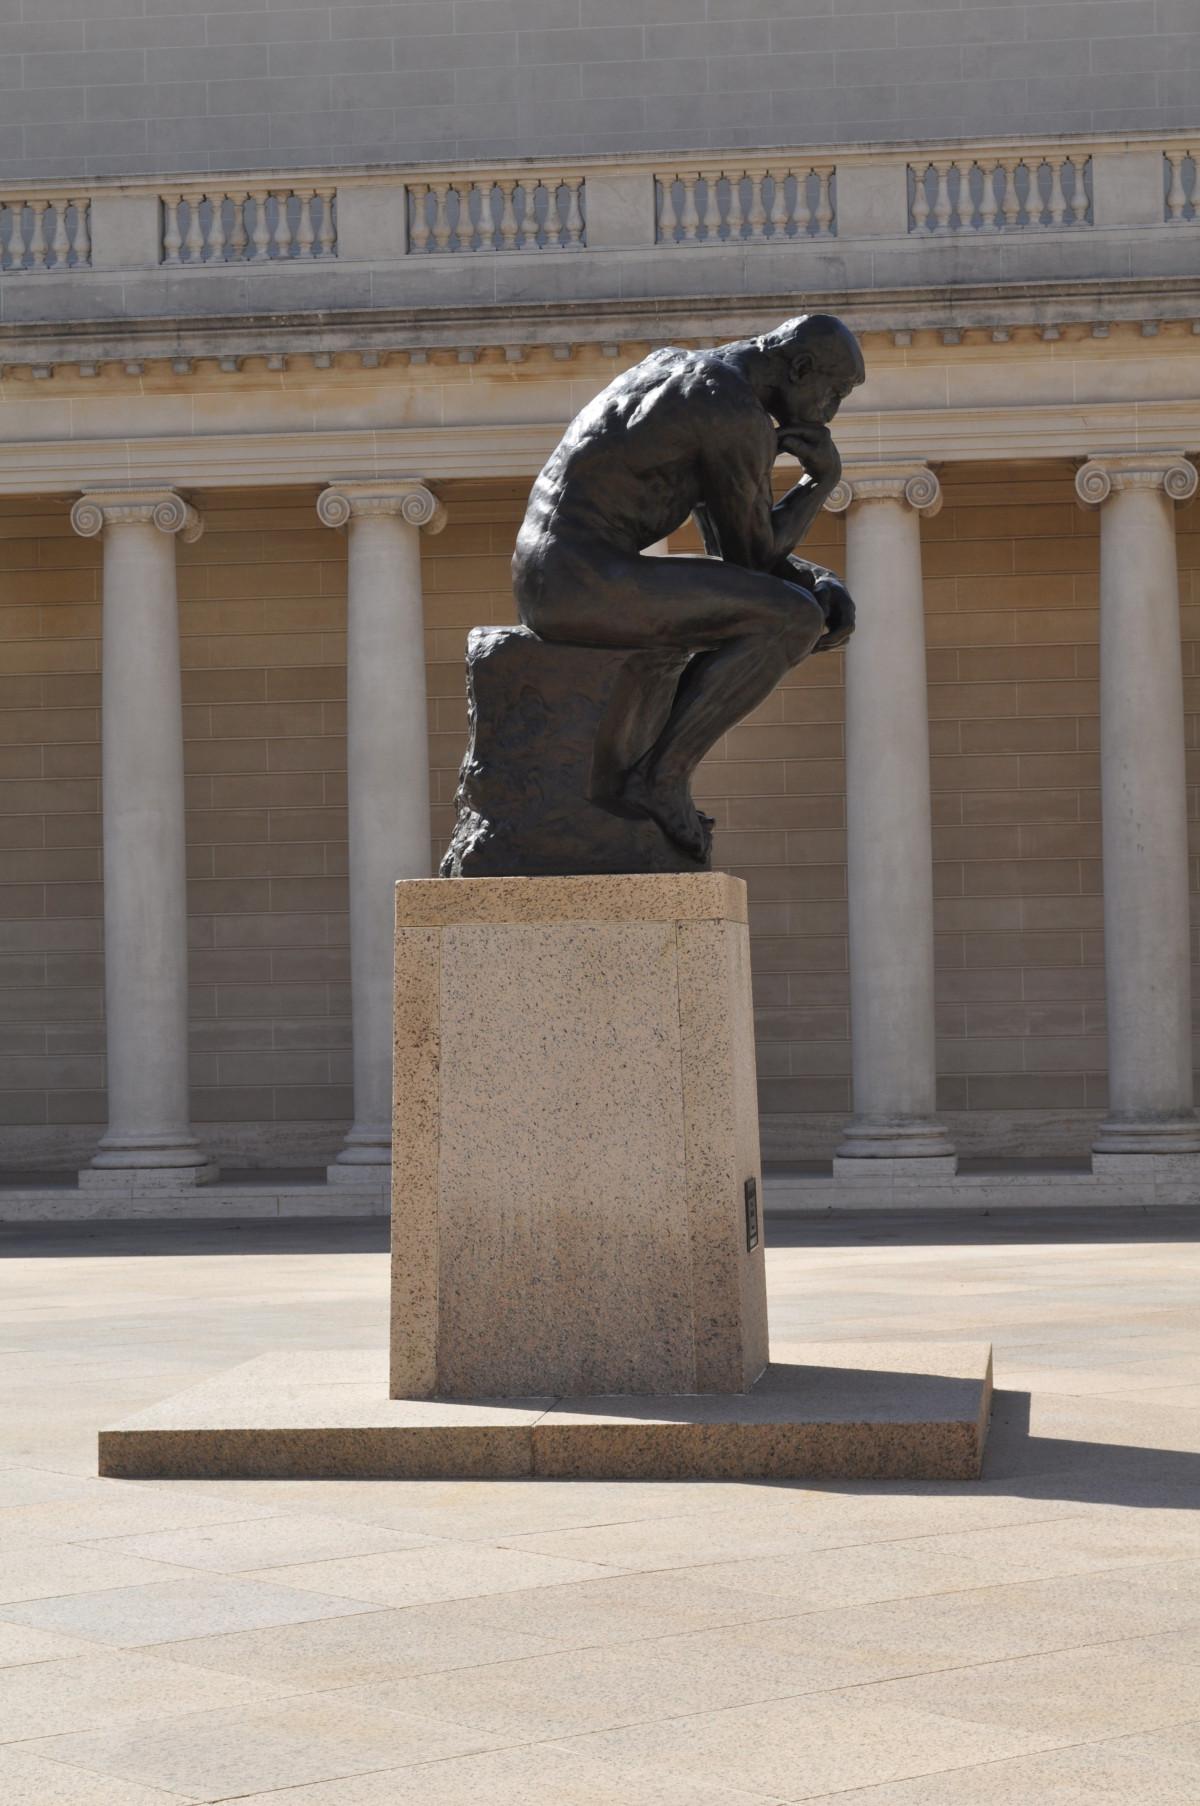 Free Images  Monument, Statue, Sculpture, Memorial, Art, Korea, Statues, Nude, Water -1934